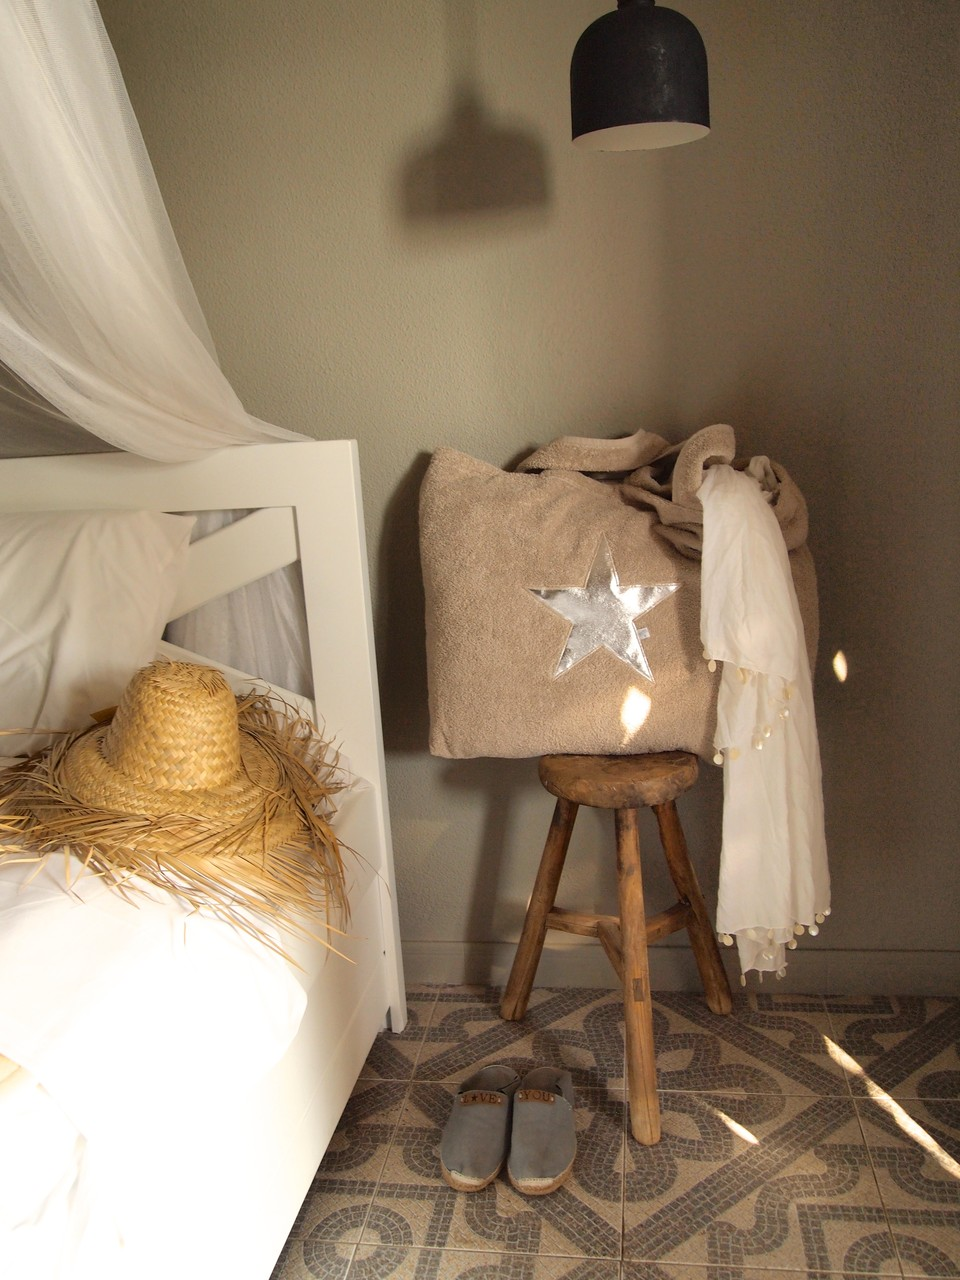 BYRH Beach Bag - Taupe - Silver Edition -  Mykonos - Hotel San Giorgio